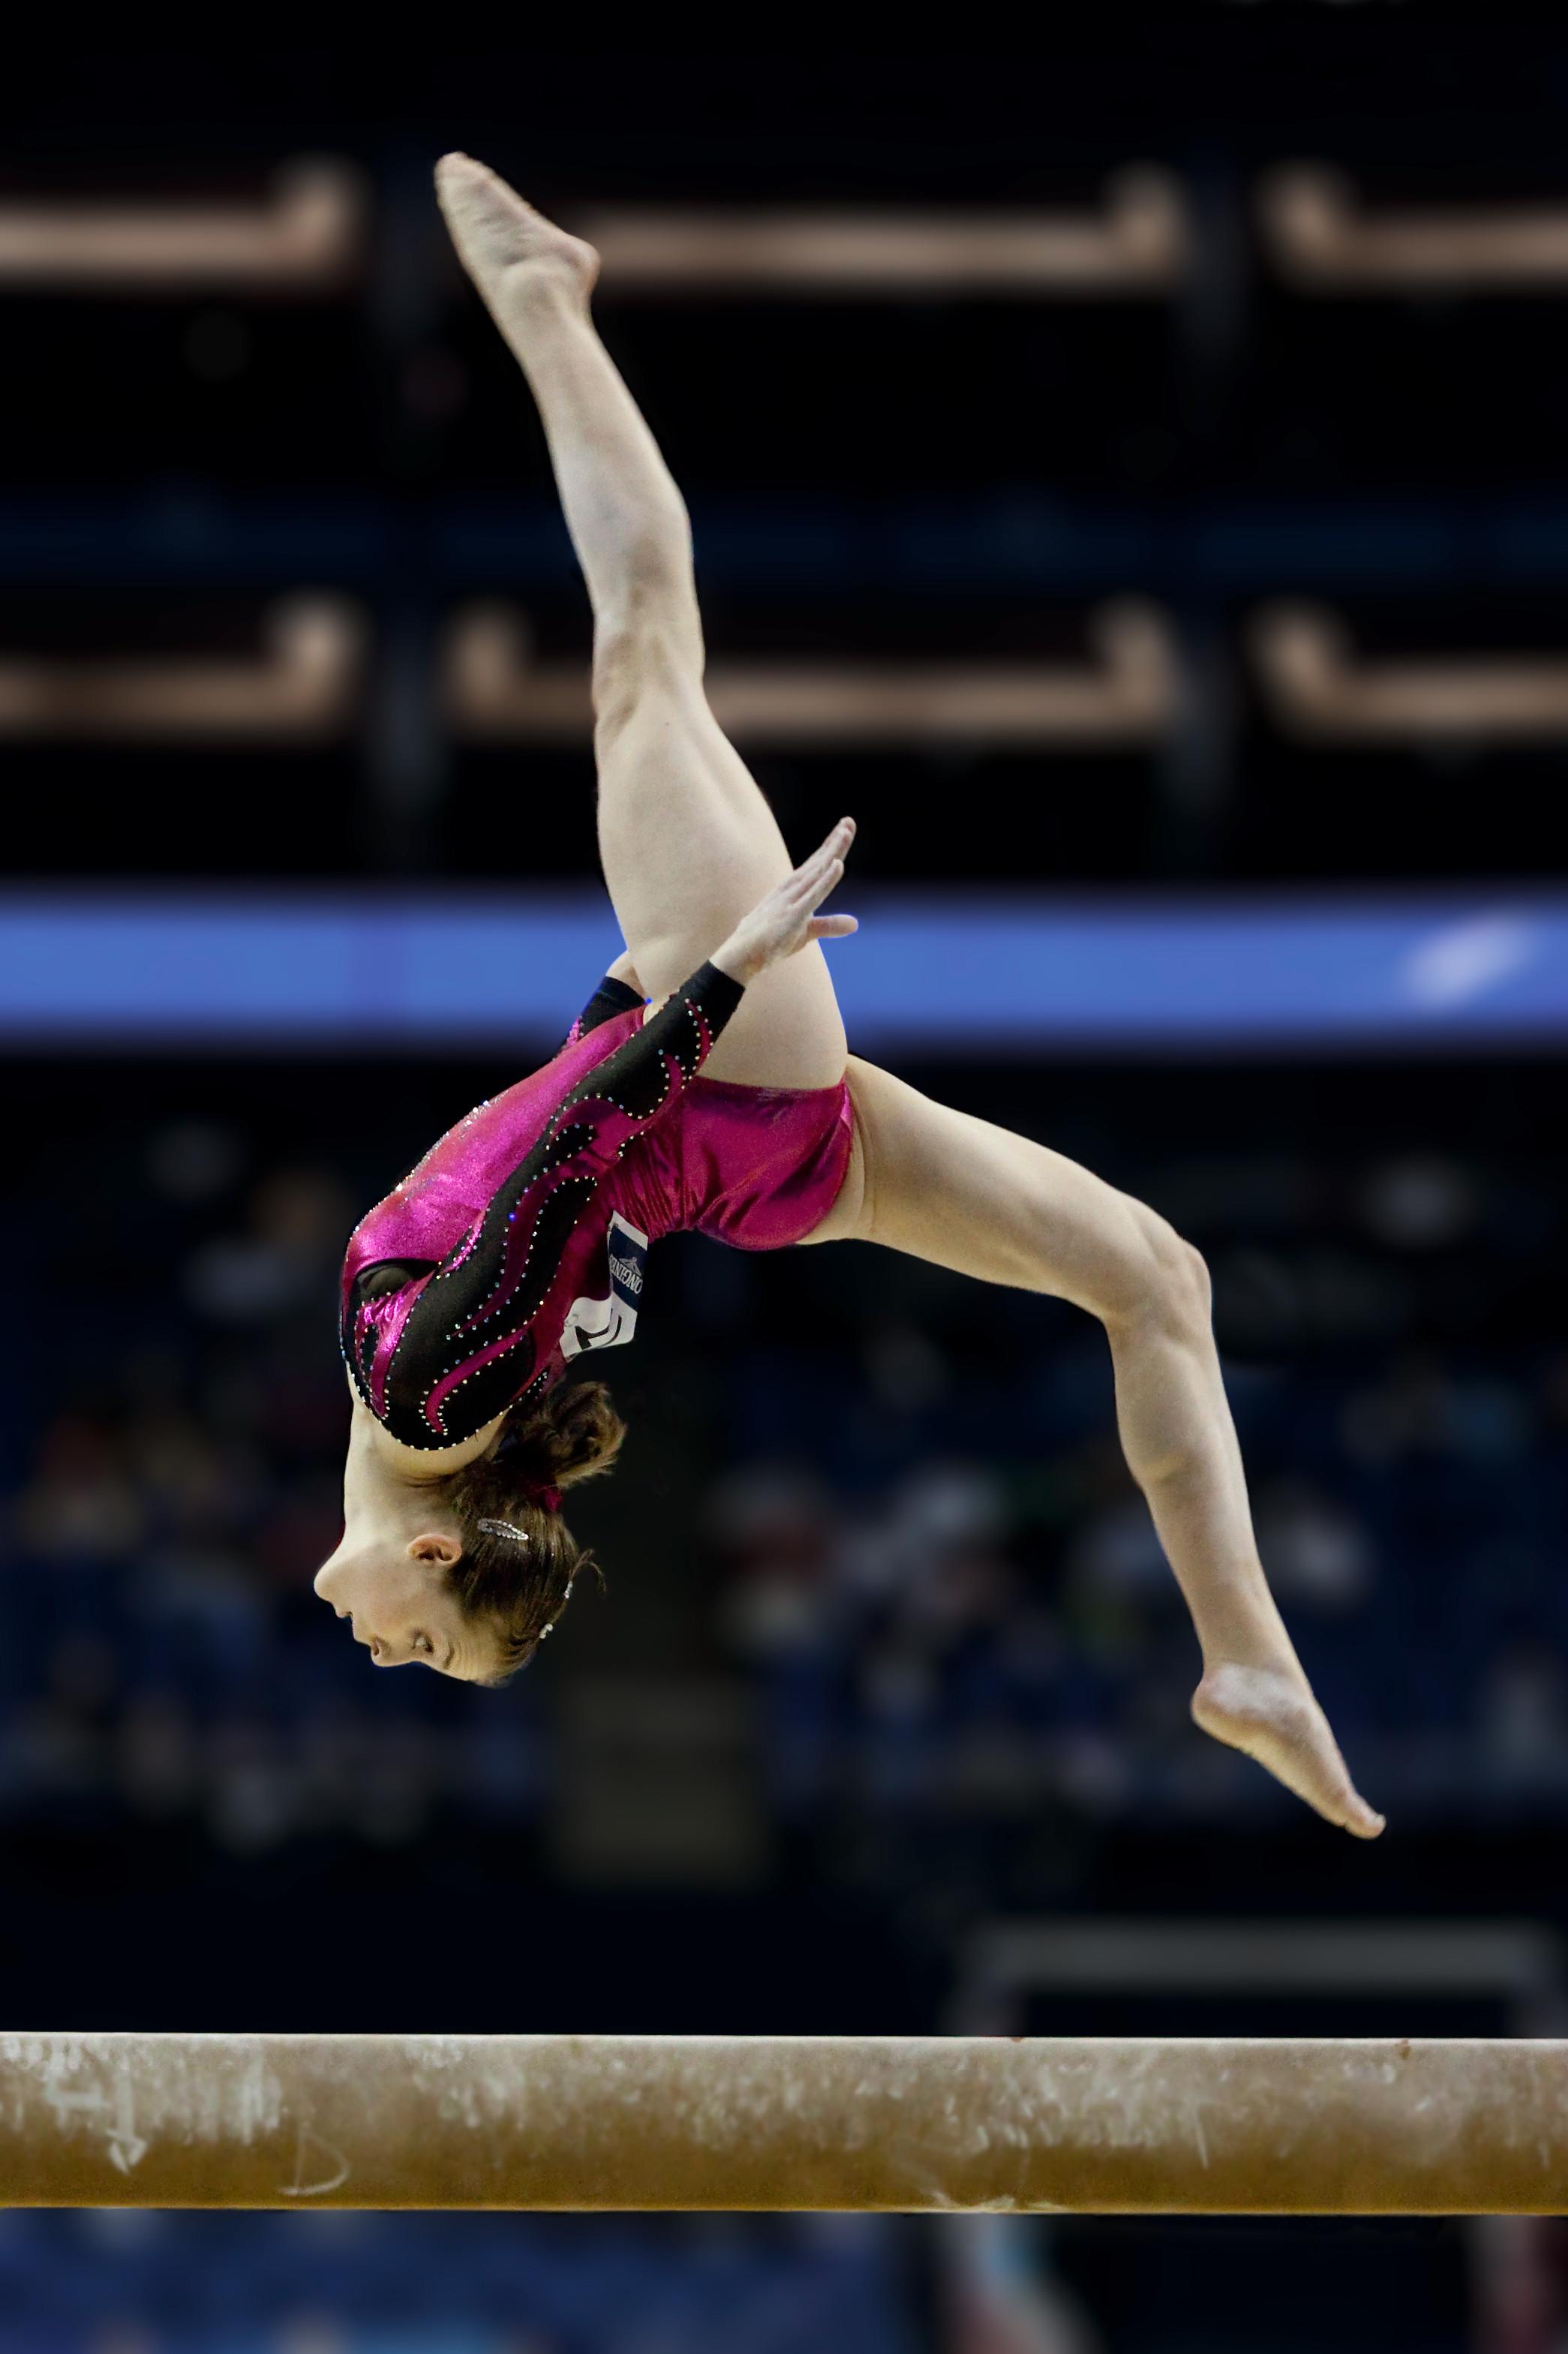 Gymnast pic photos 98